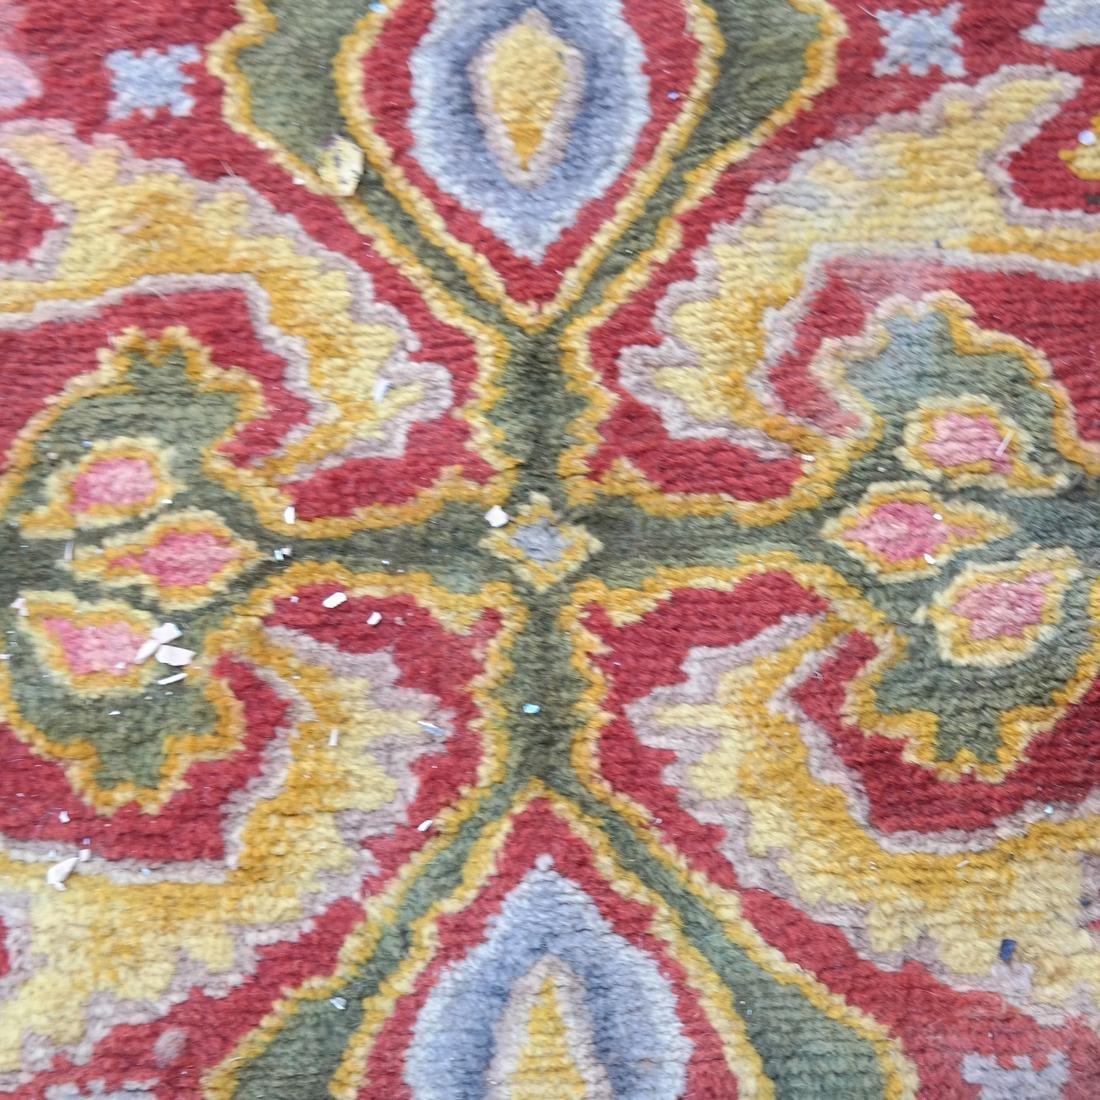 Spanish Savonnerie  Rug - Carpet - 3